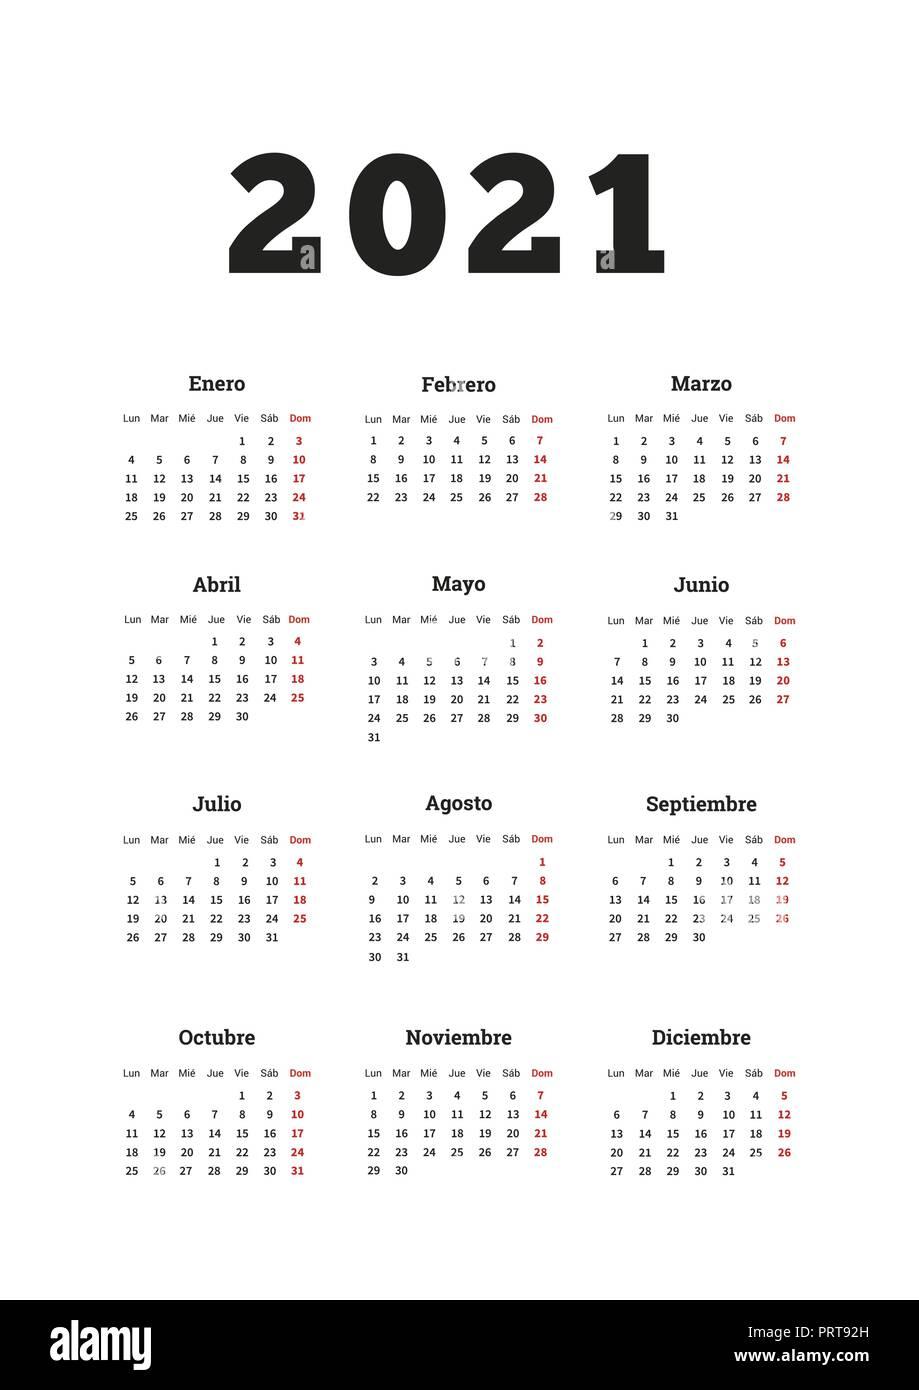 2021 año calendario simple en español, hoja vertical de tamaño A4